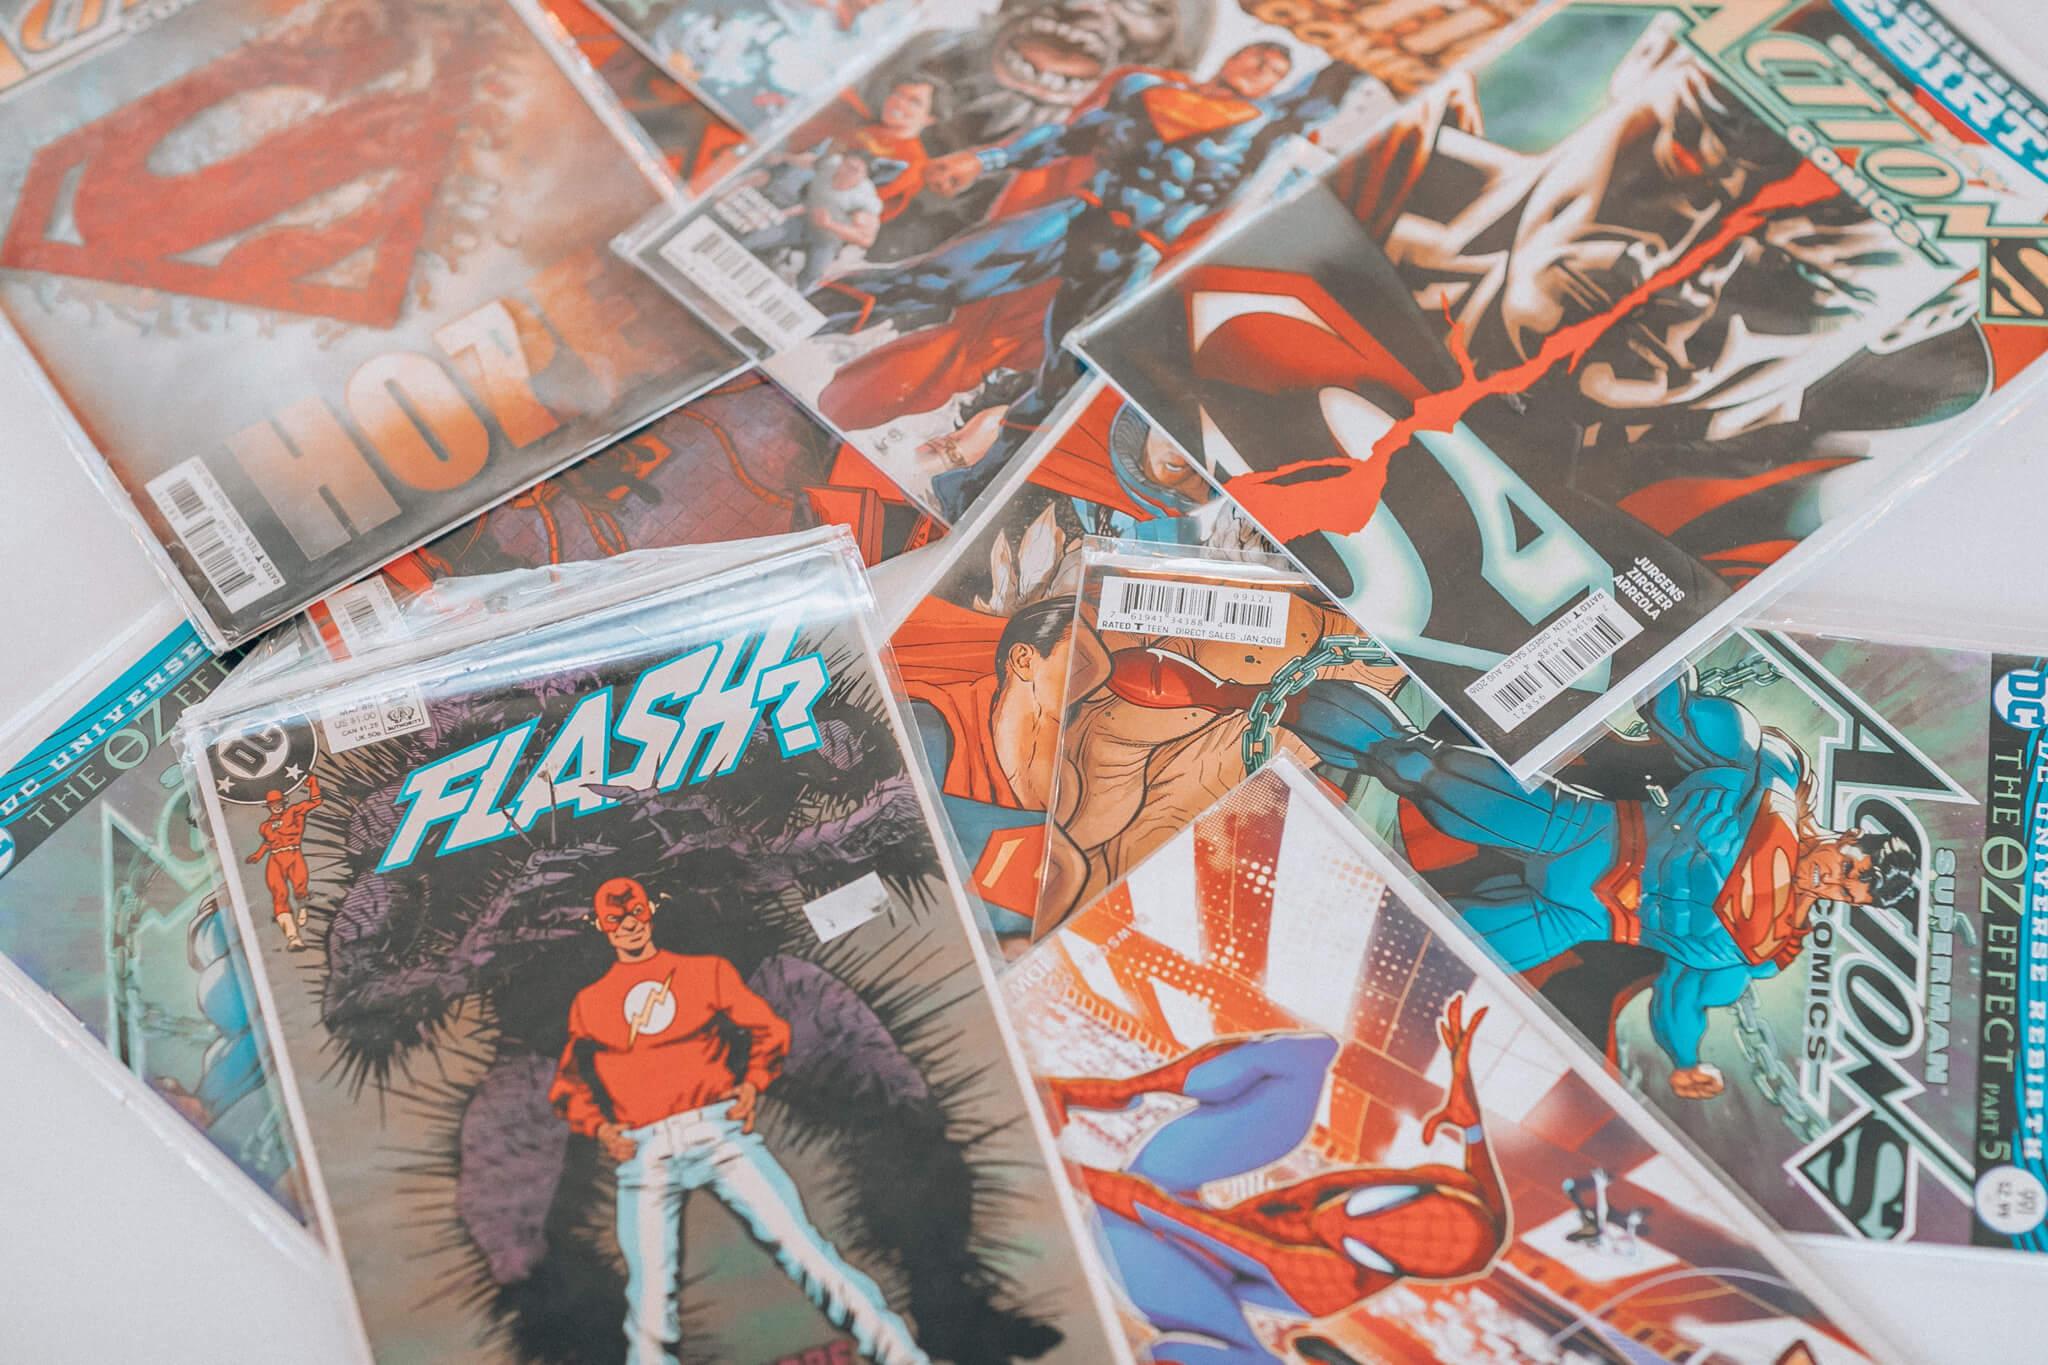 Viking FM Cash For Kids Superhero Day